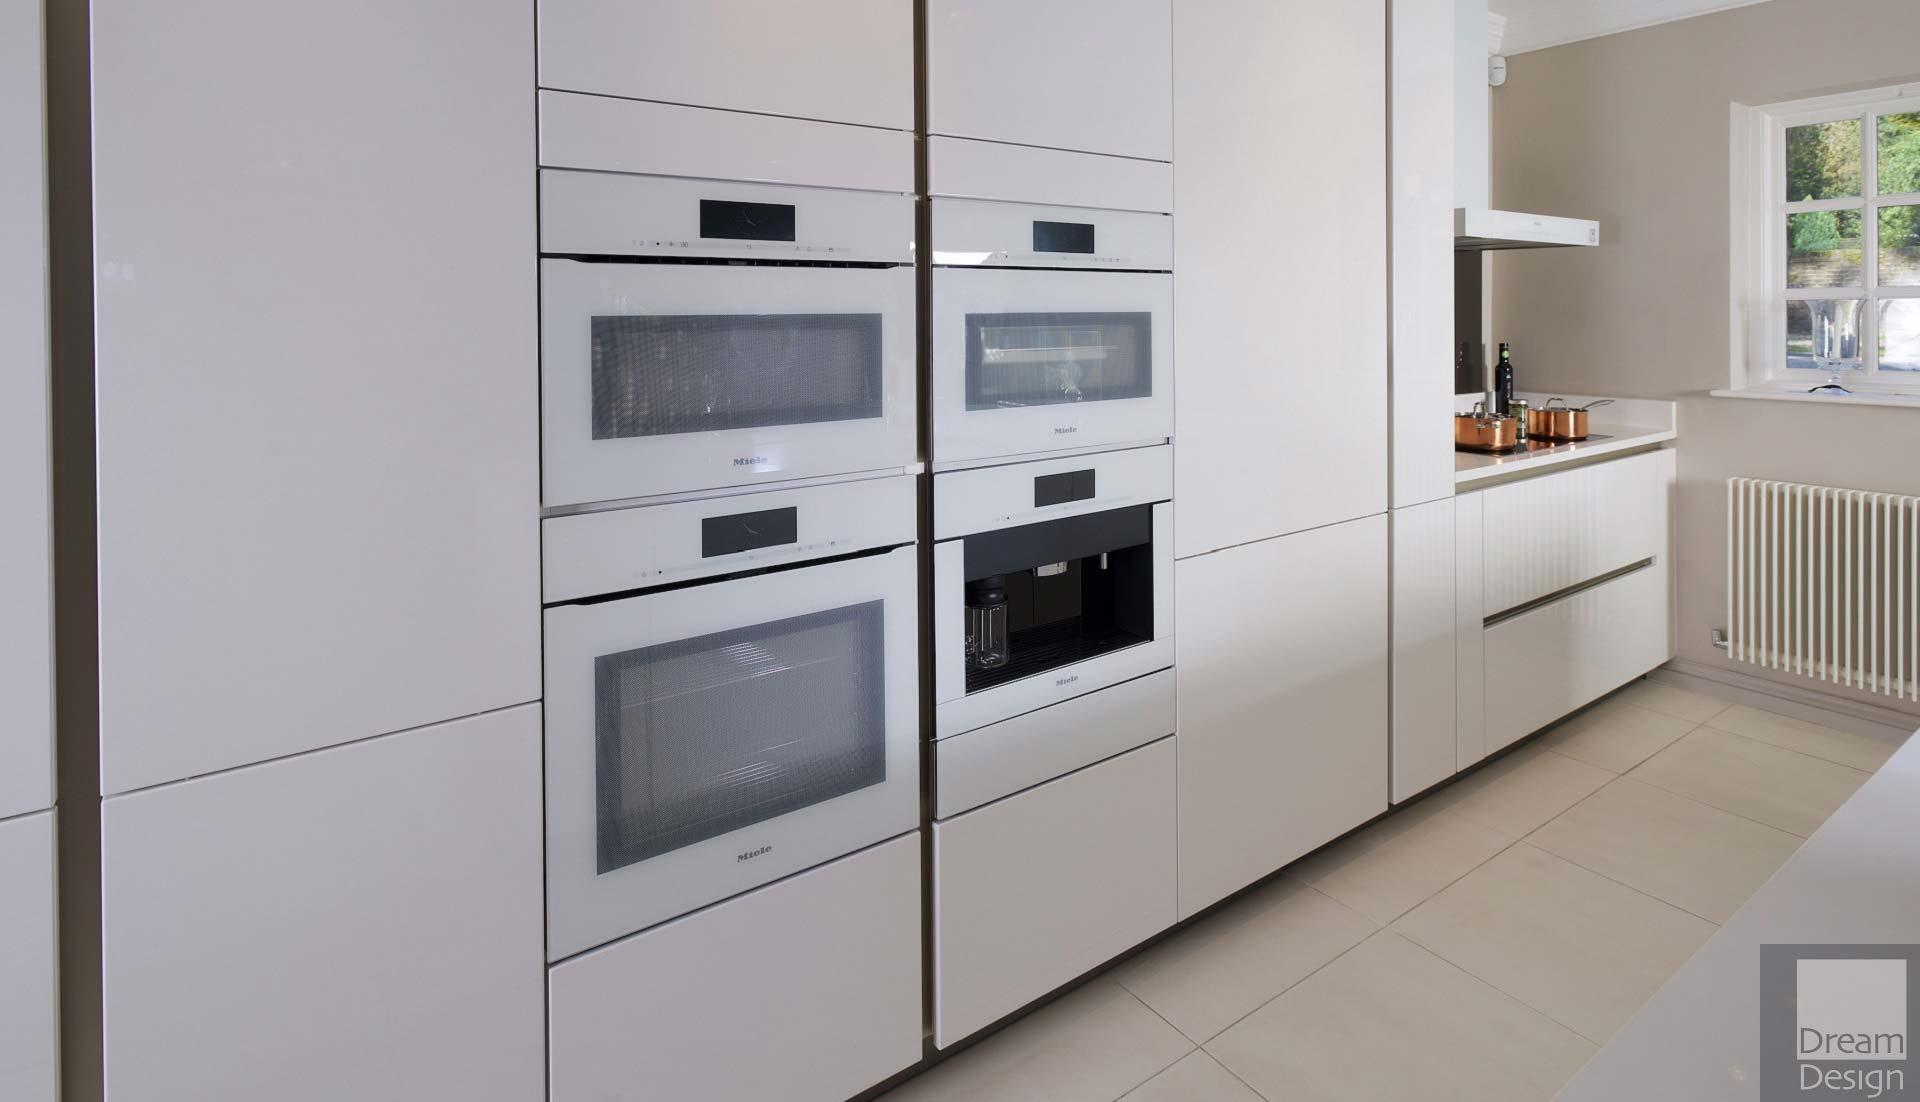 andrew james kitchen  previous  next siematic s2  u0026 andrew james kitchen   dream design interiors ltd  rh   dreamdesign co uk